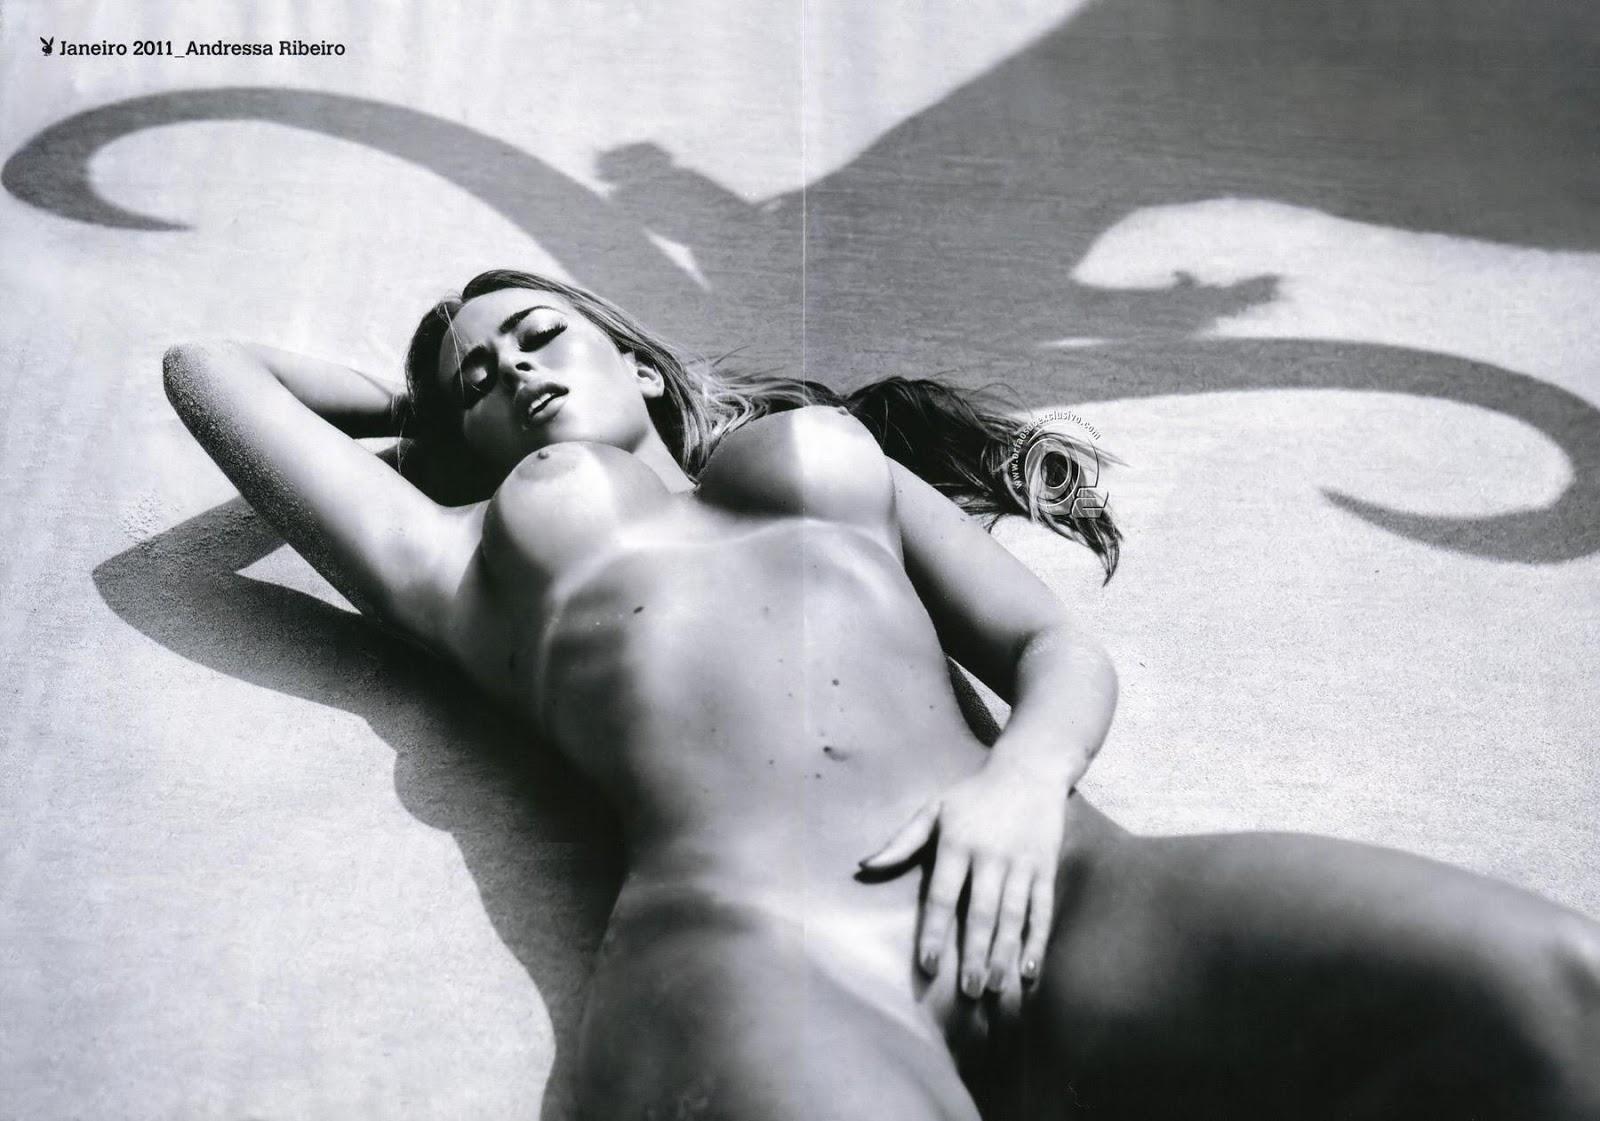 picture of big penisblack